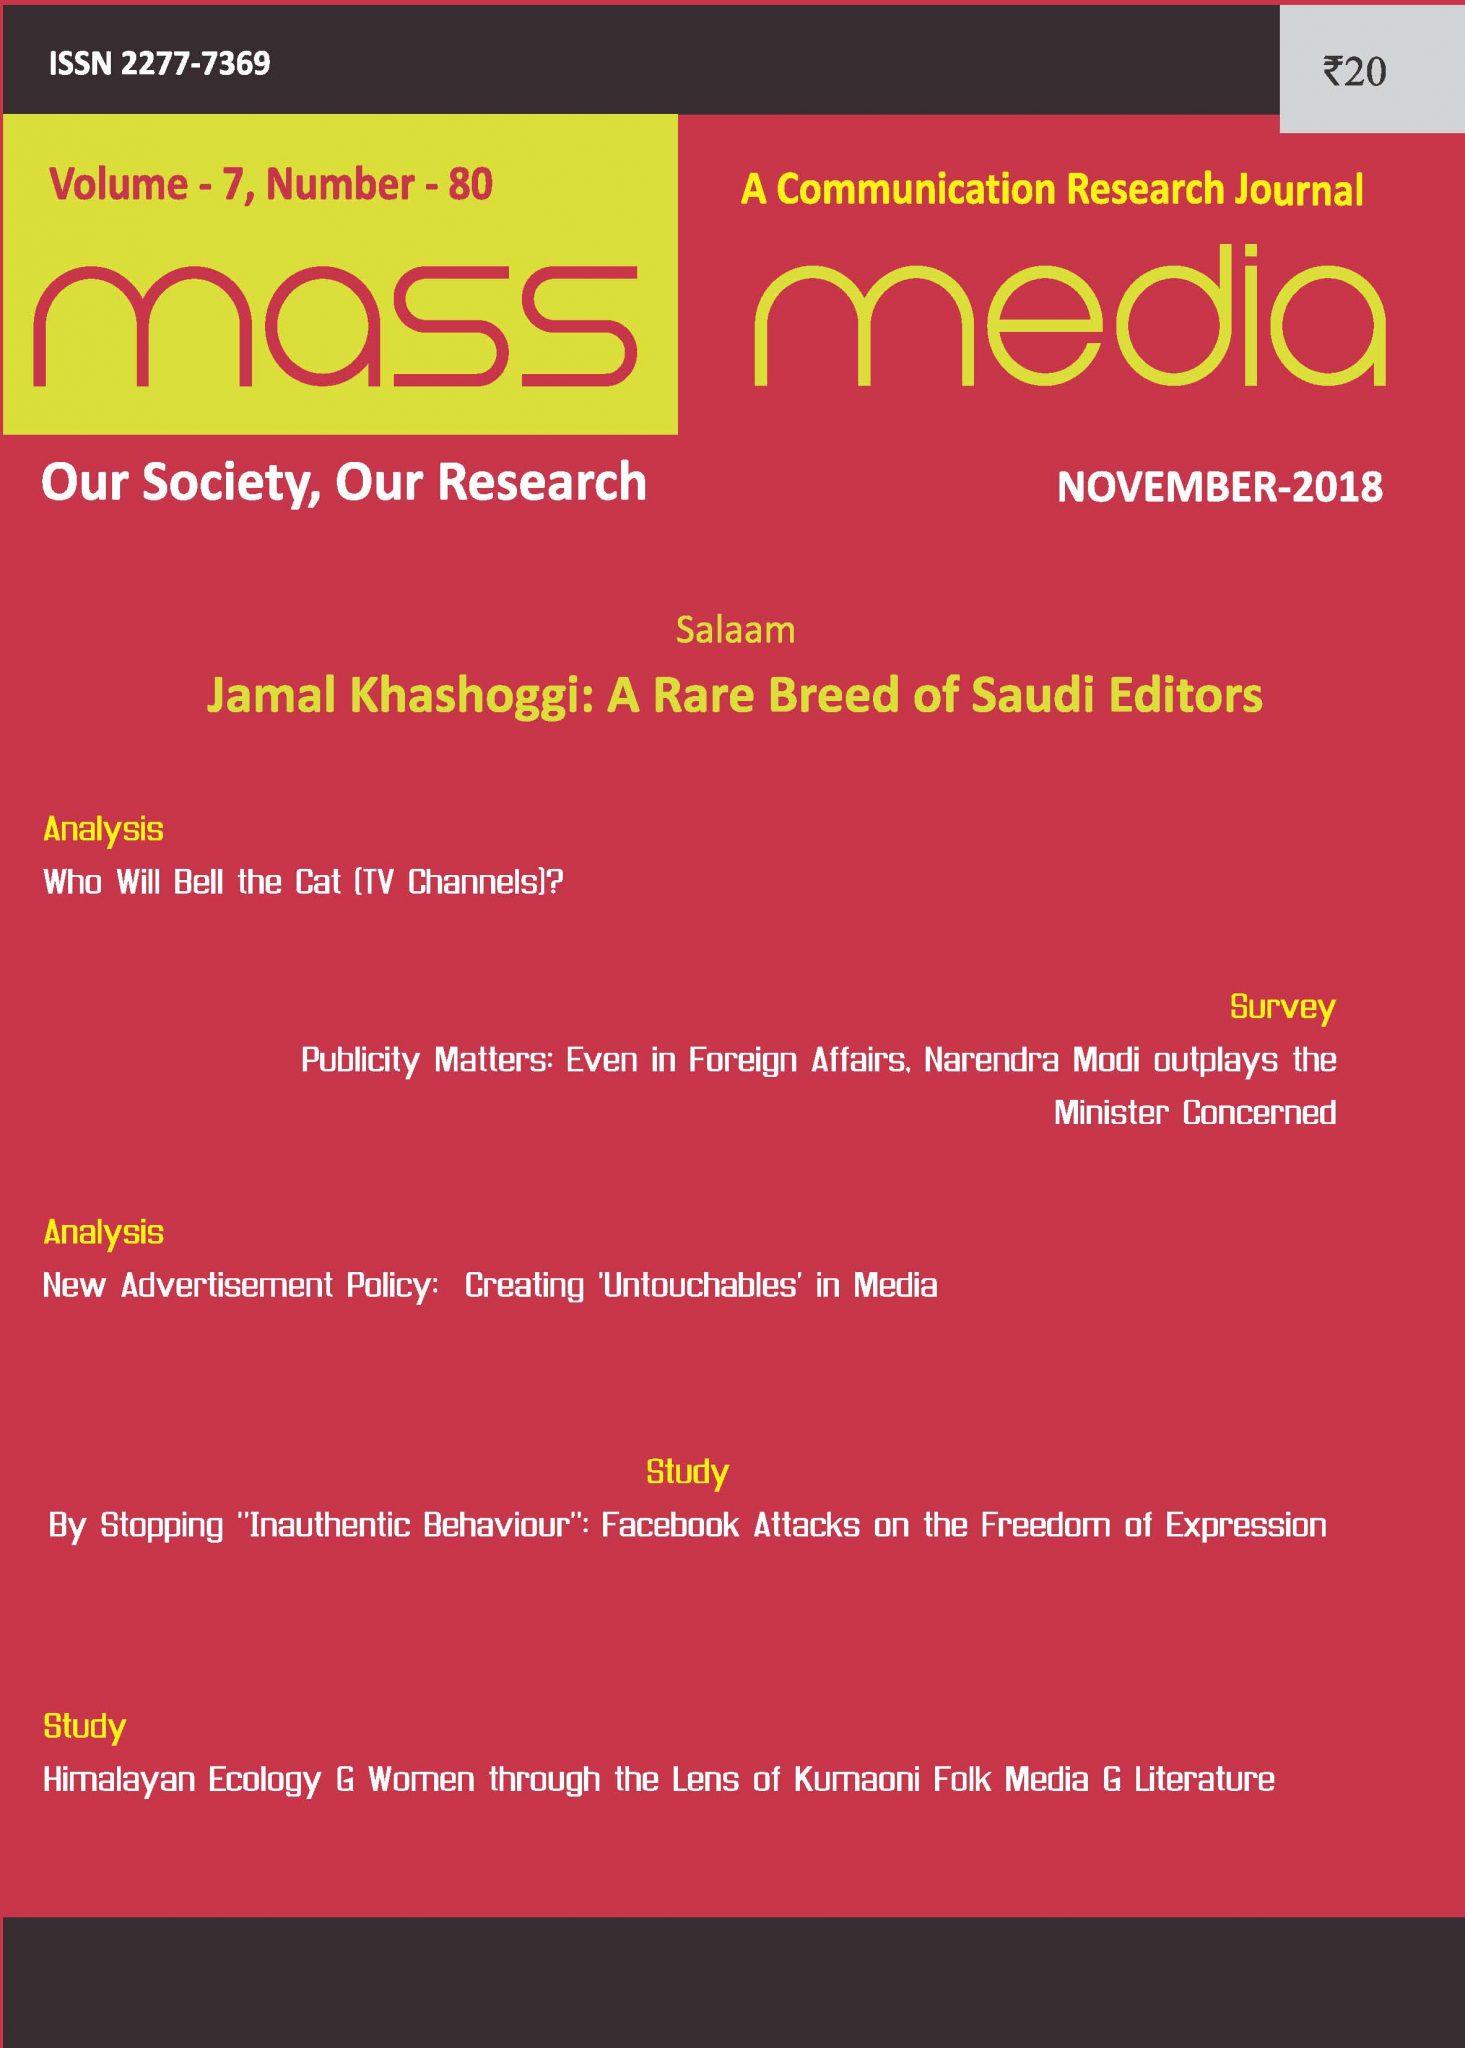 Mass Media (November 2018)